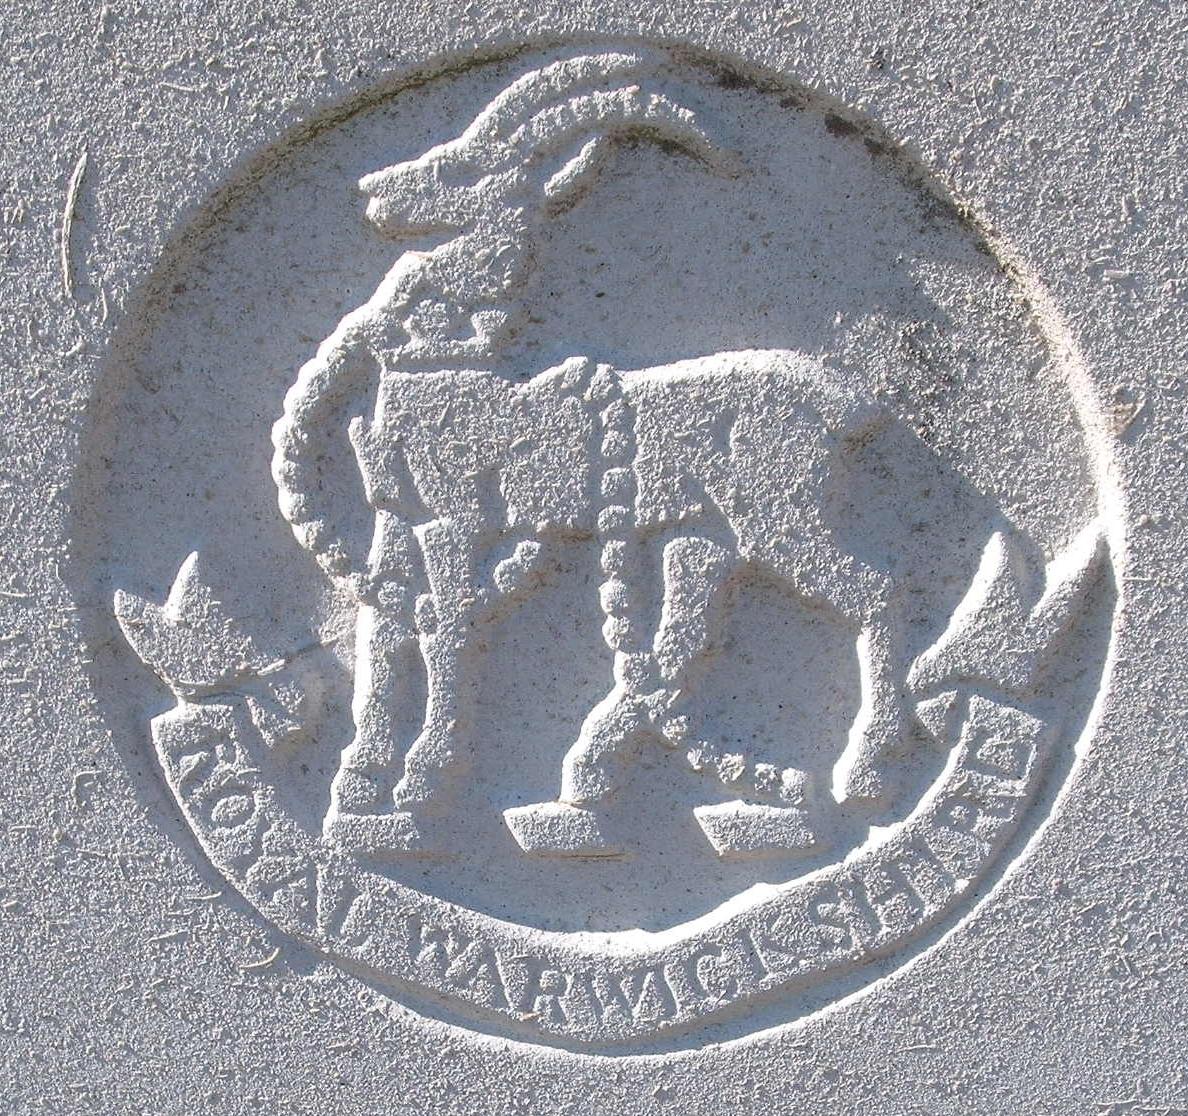 Capbadge of the Royal Warwickshire Regiment